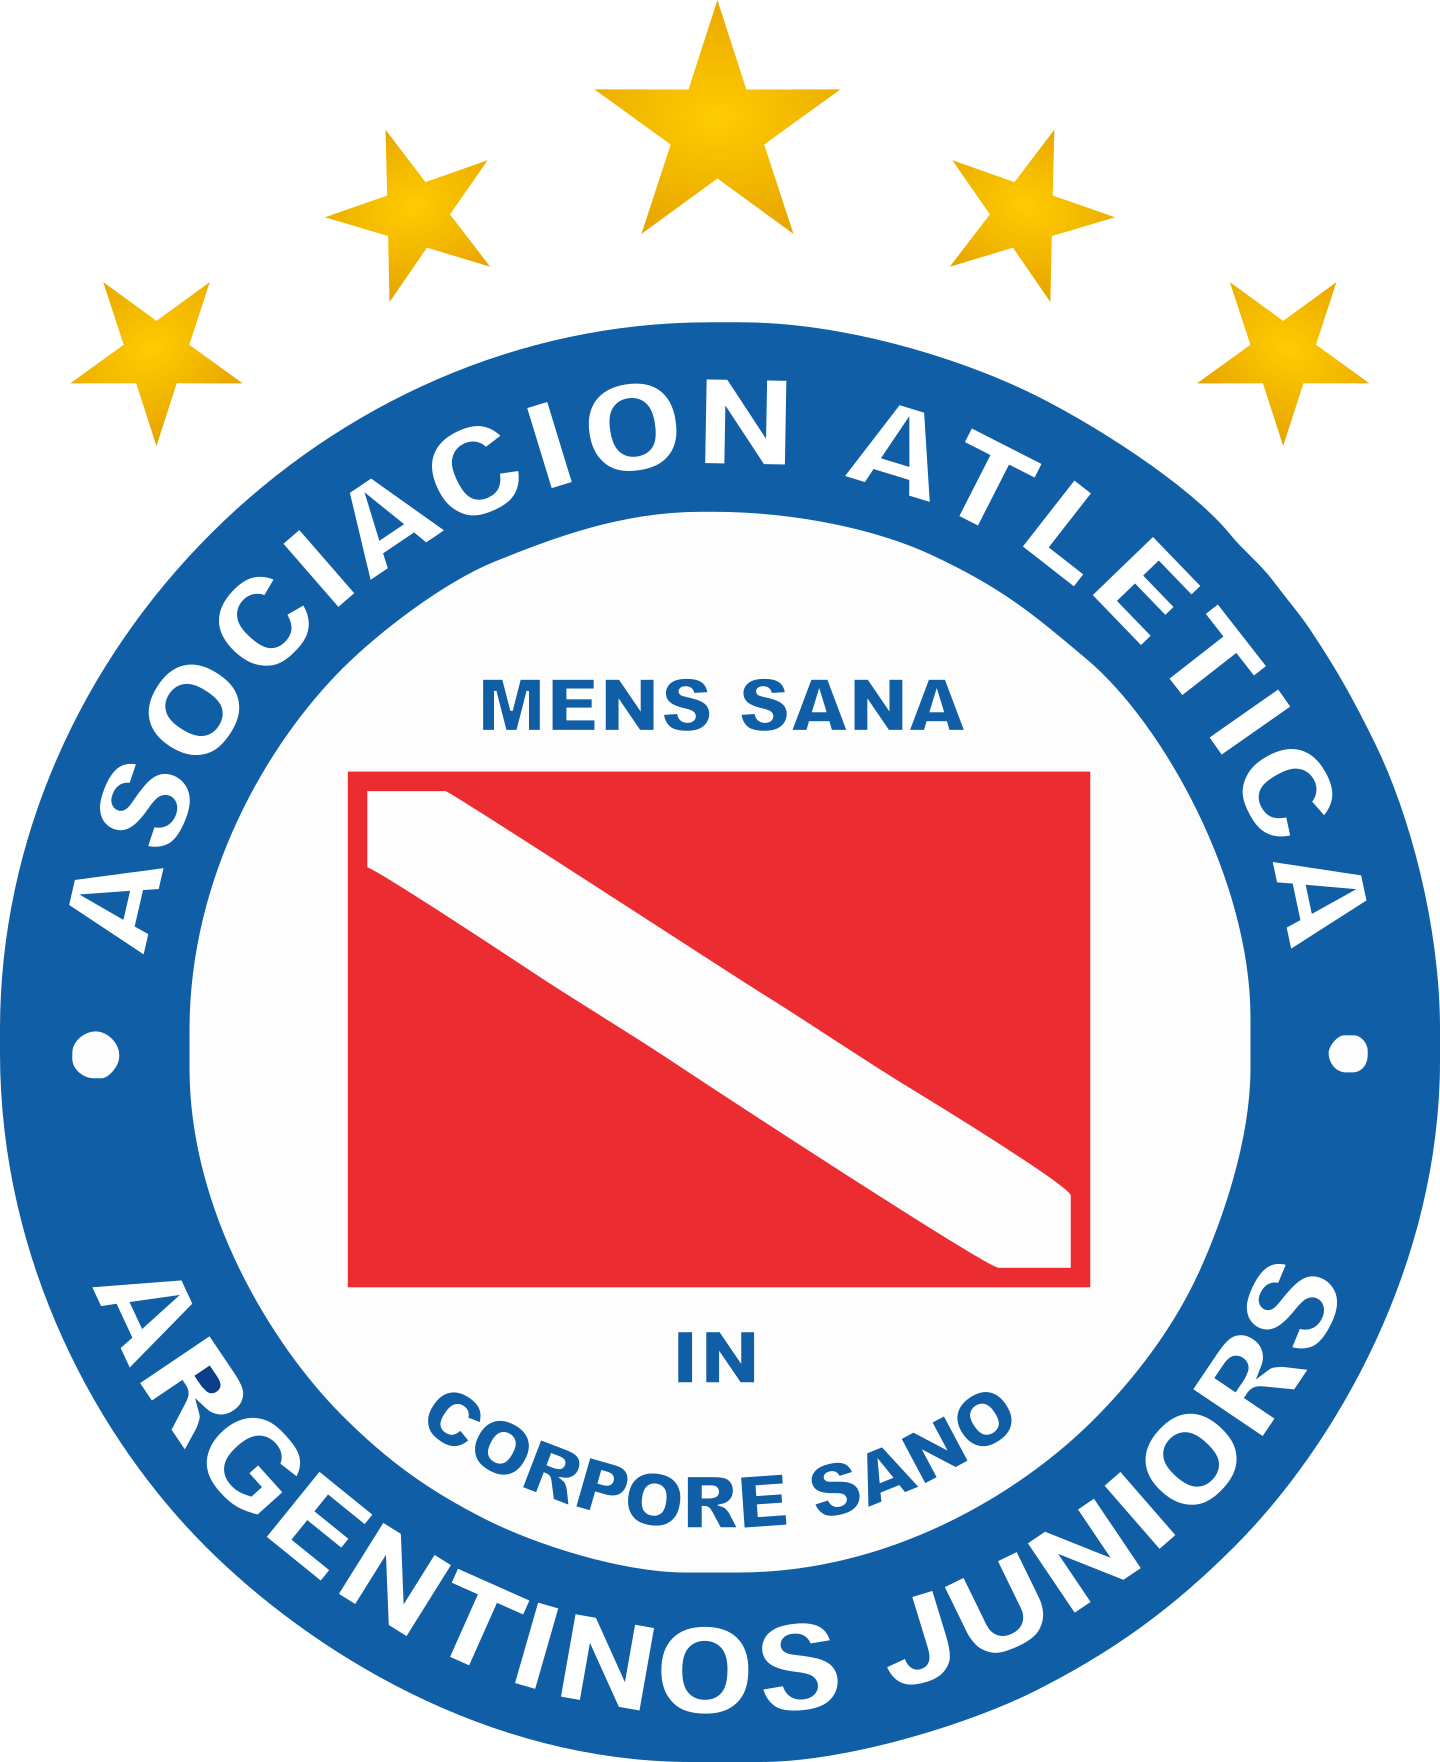 argentinos juniors logo 3 - Argentinos Juniors Logo